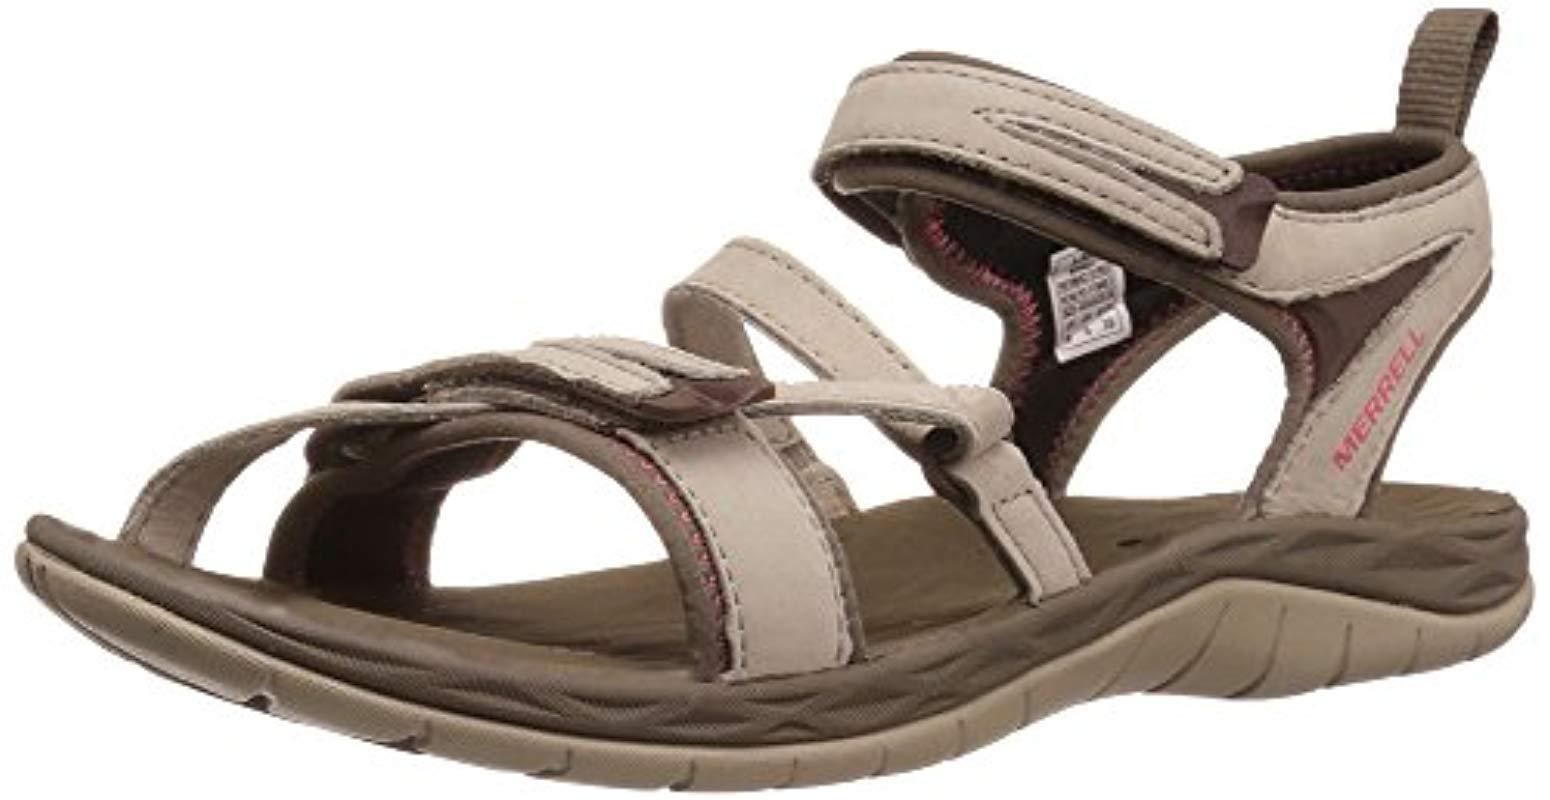 Merrell Siren Strap Q2 Open Toe Sandals in Gray - Lyst ffa0a47aa7